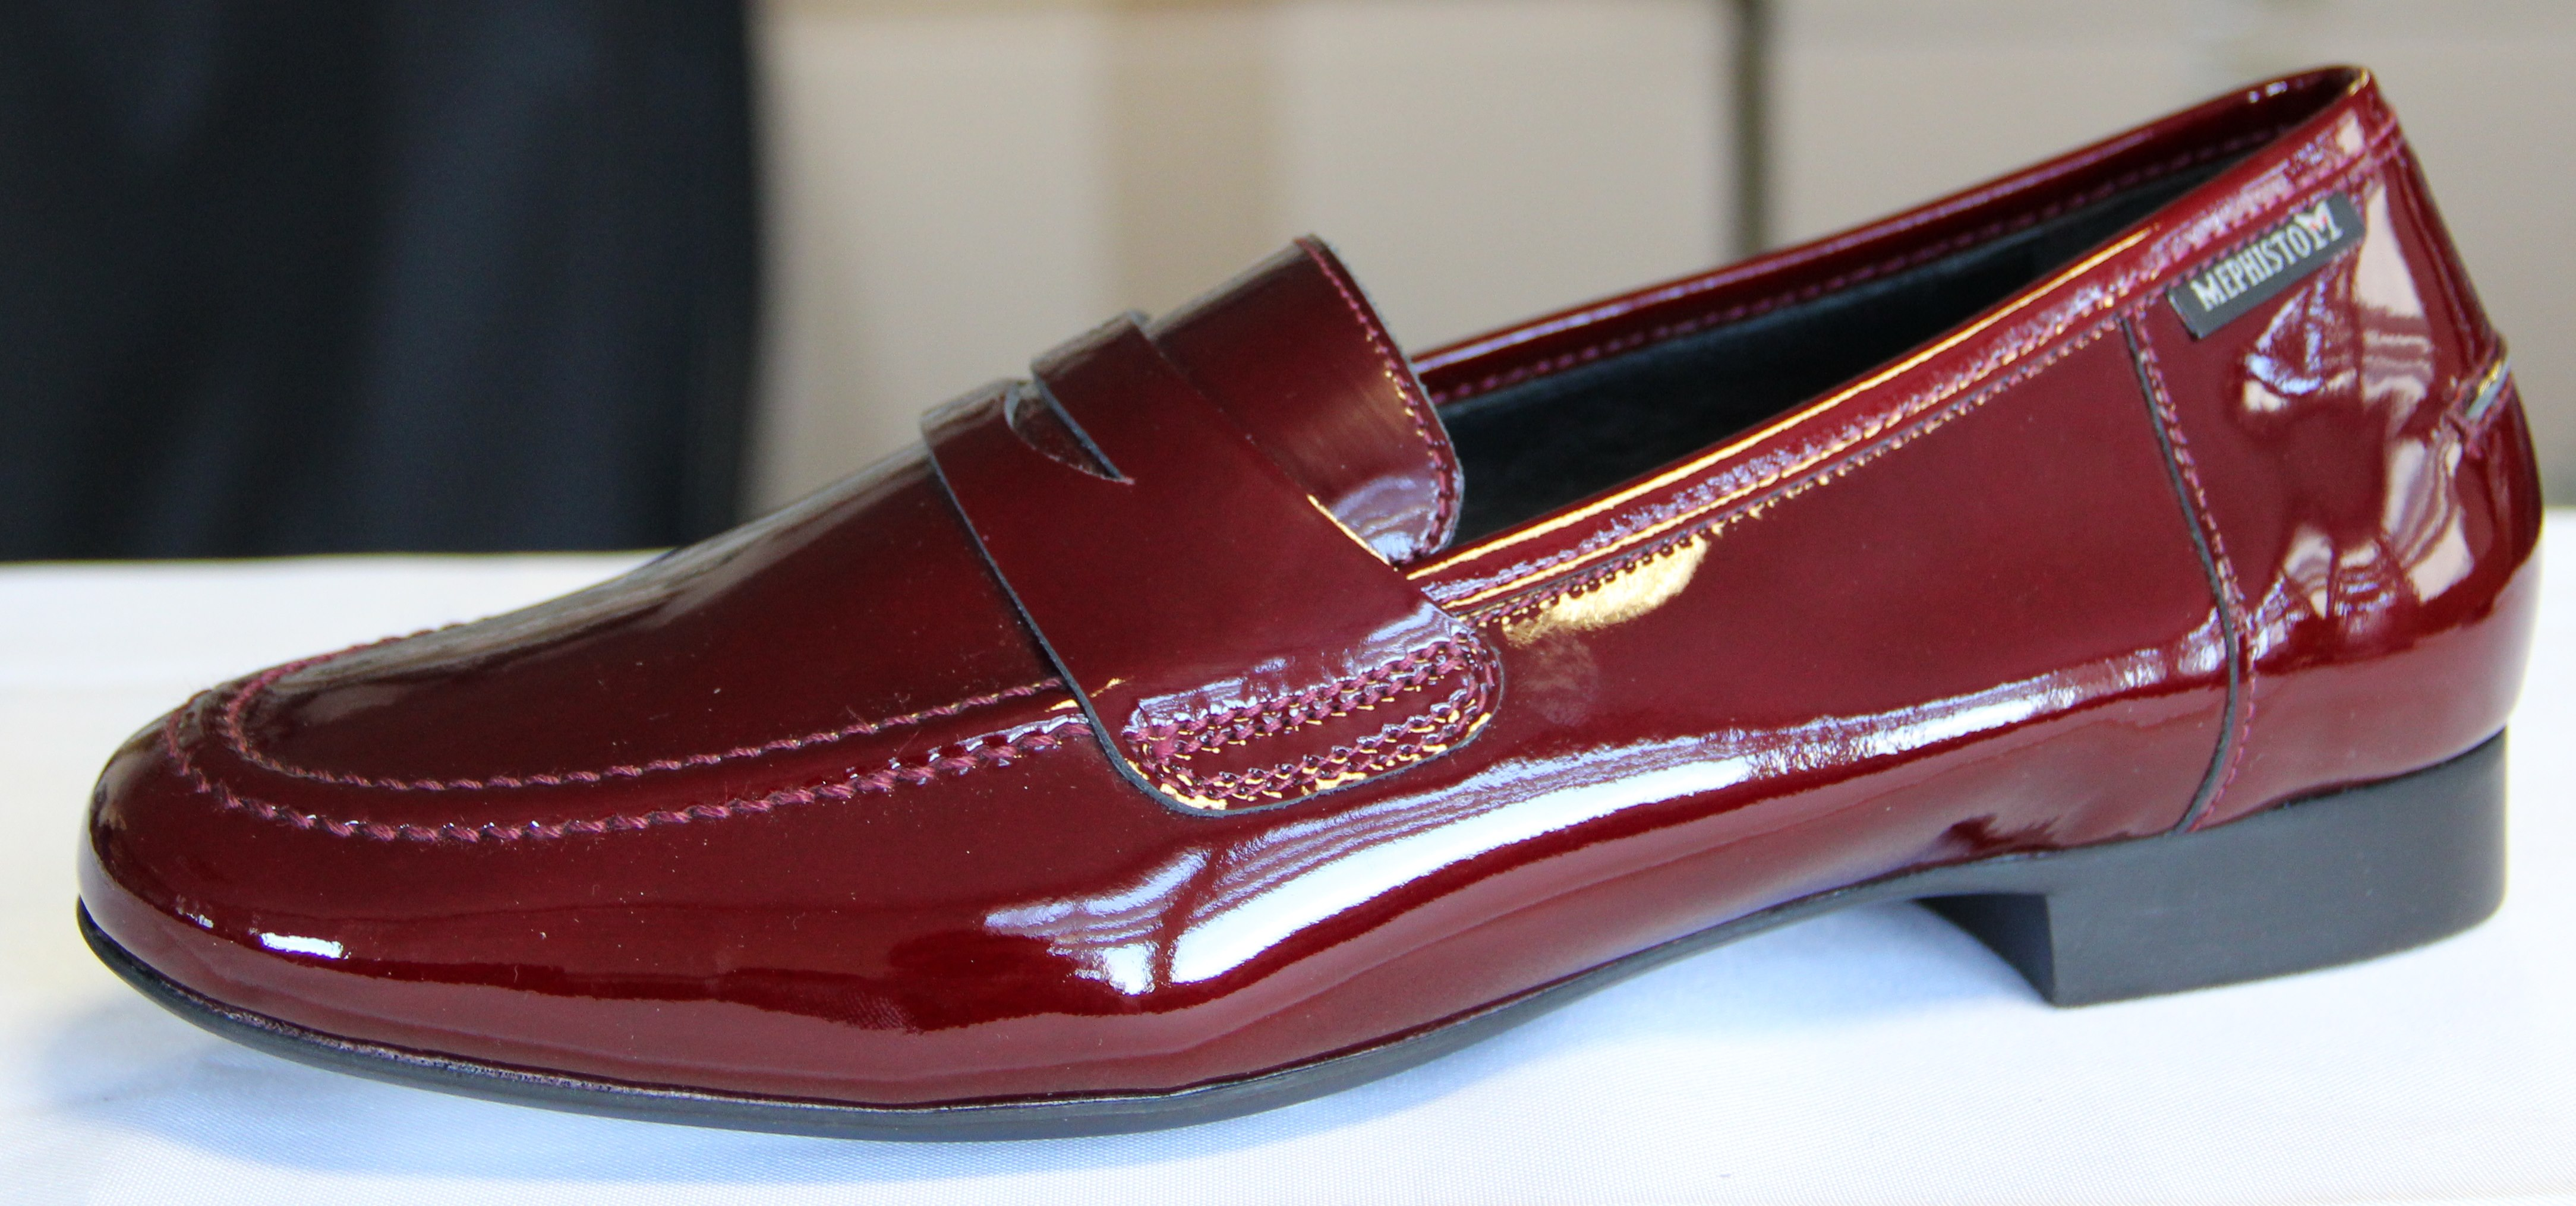 fbe26cd6ff7f34 Mephisto-Shop chaussures confortables mocassins femme - modèle ...